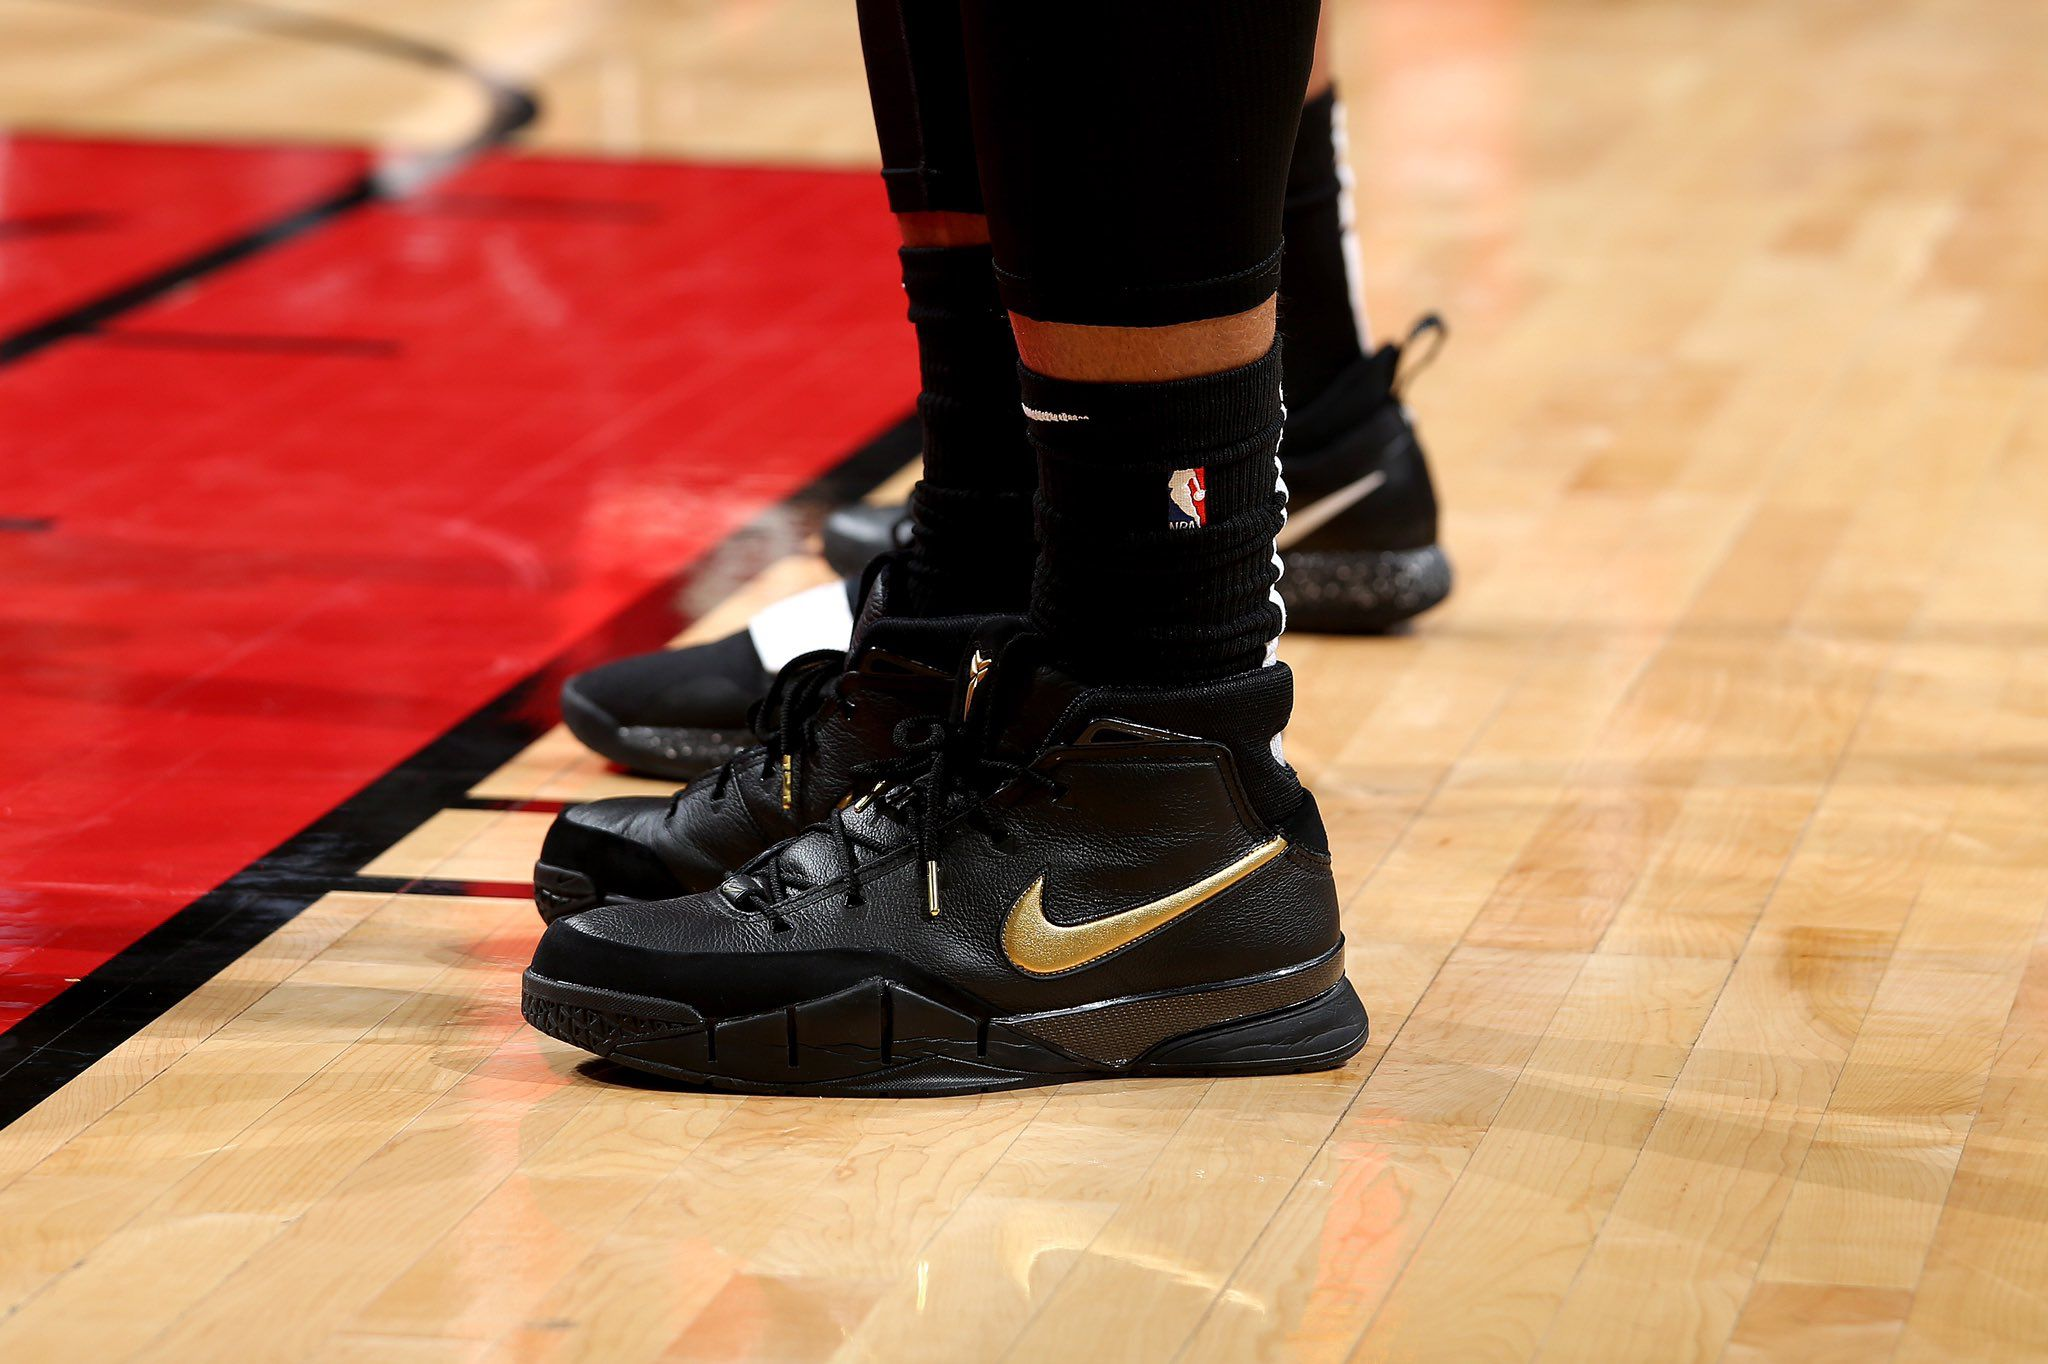 d6af6bc1871 San Antonio Spurs (18-19) DeMar DeRozan Nike Zoom Kobe 1 Protro ...